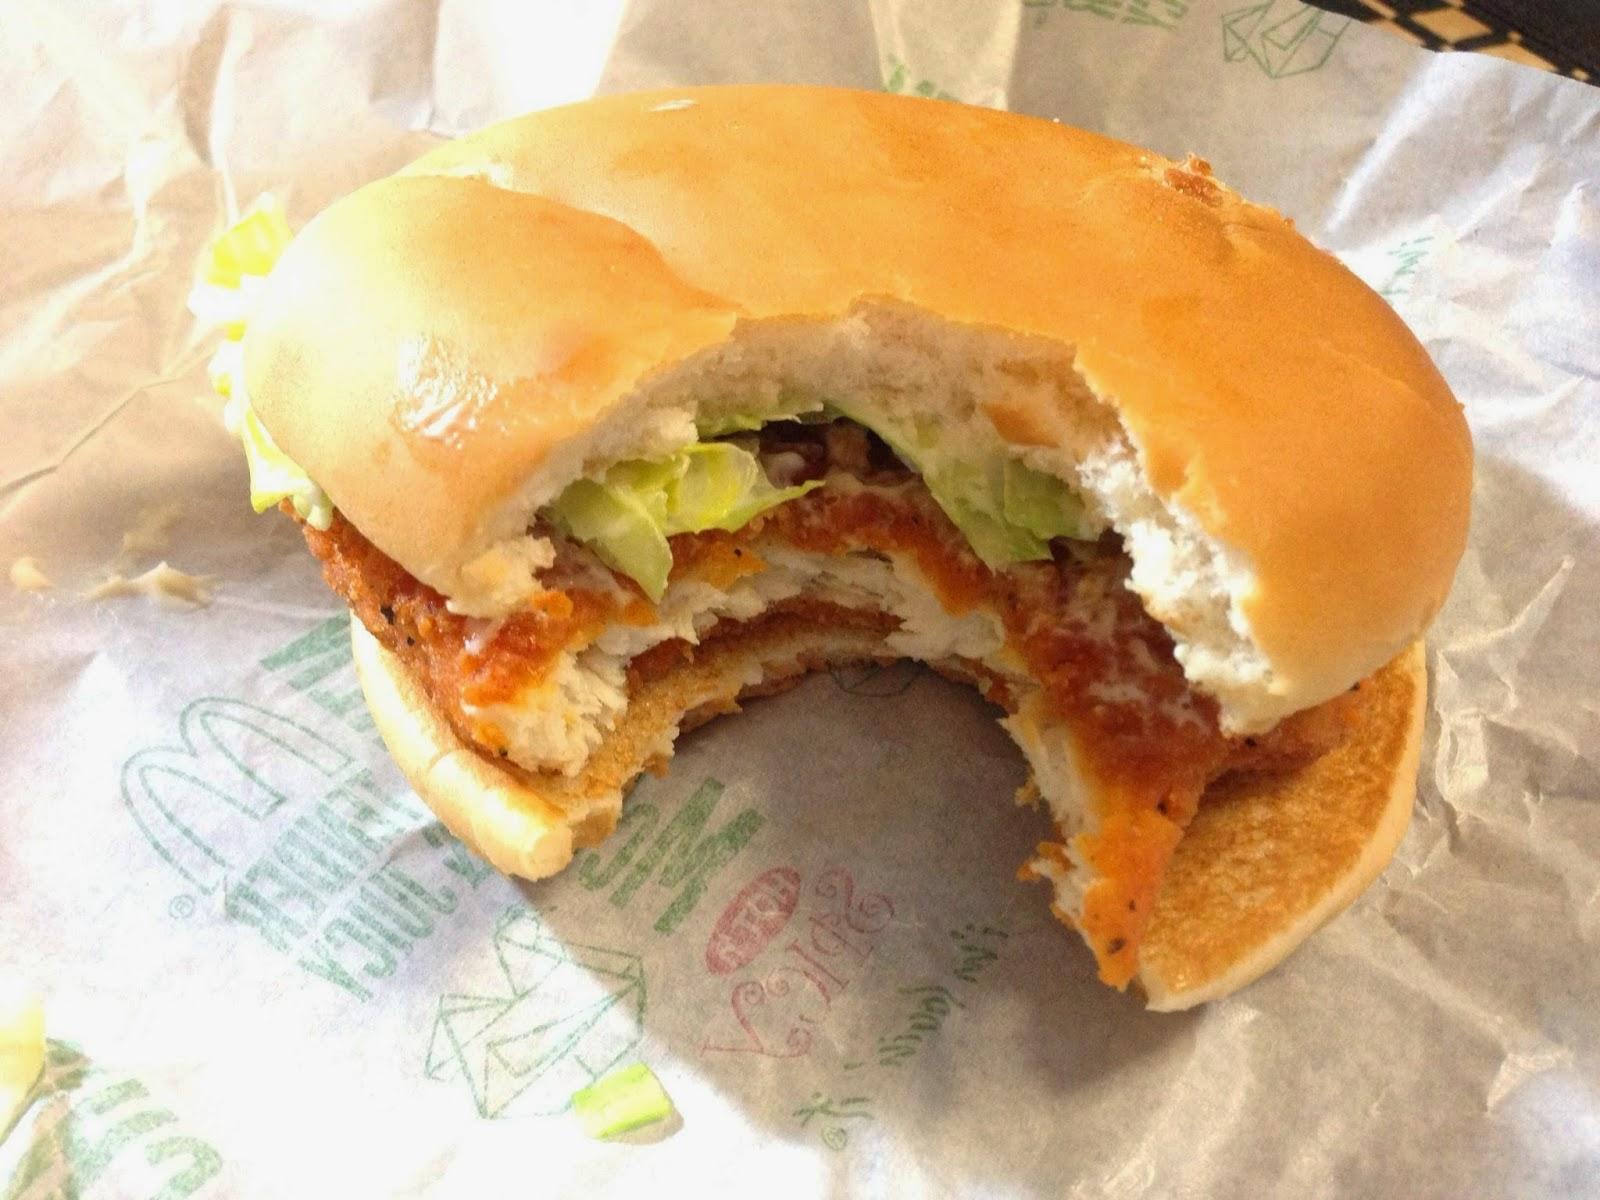 Health Department Confirmed Semen found on McDonald's Mayonnaise